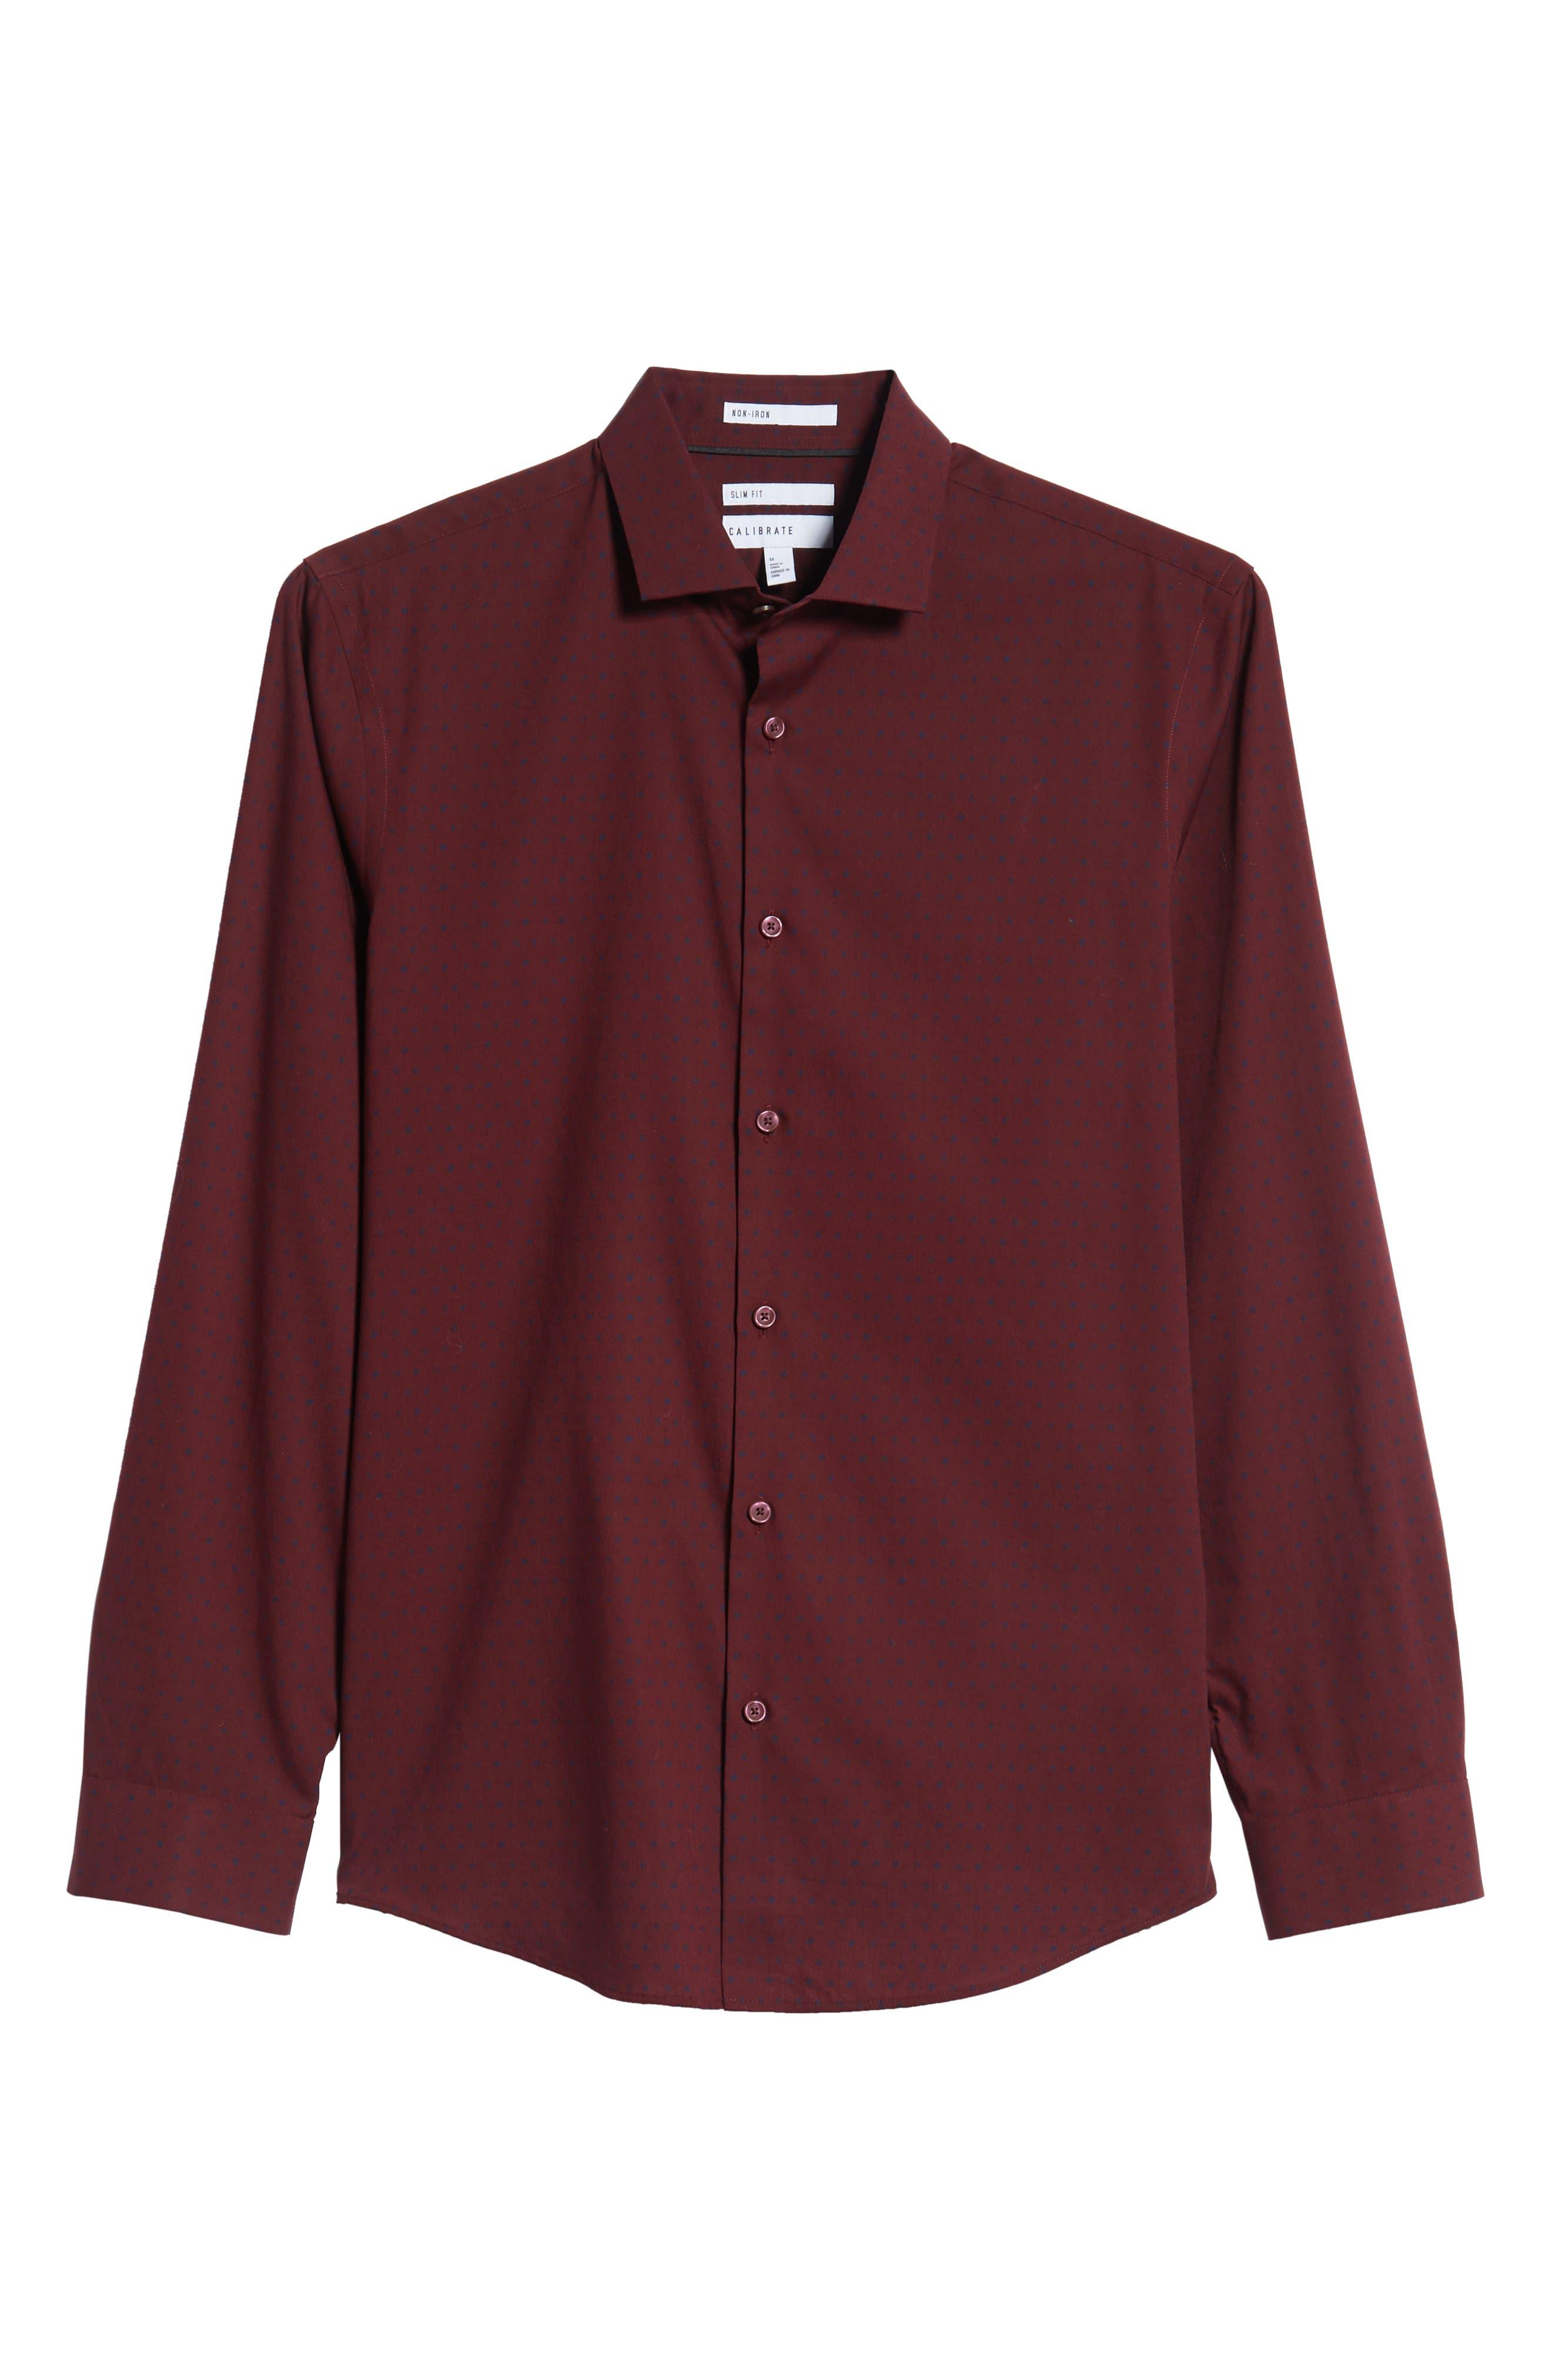 Slim Fit Non Iron Polka Dot Sport Shirt,                             Alternate thumbnail 5, color,                             BURGUNDY ROYALE NAVY DOT